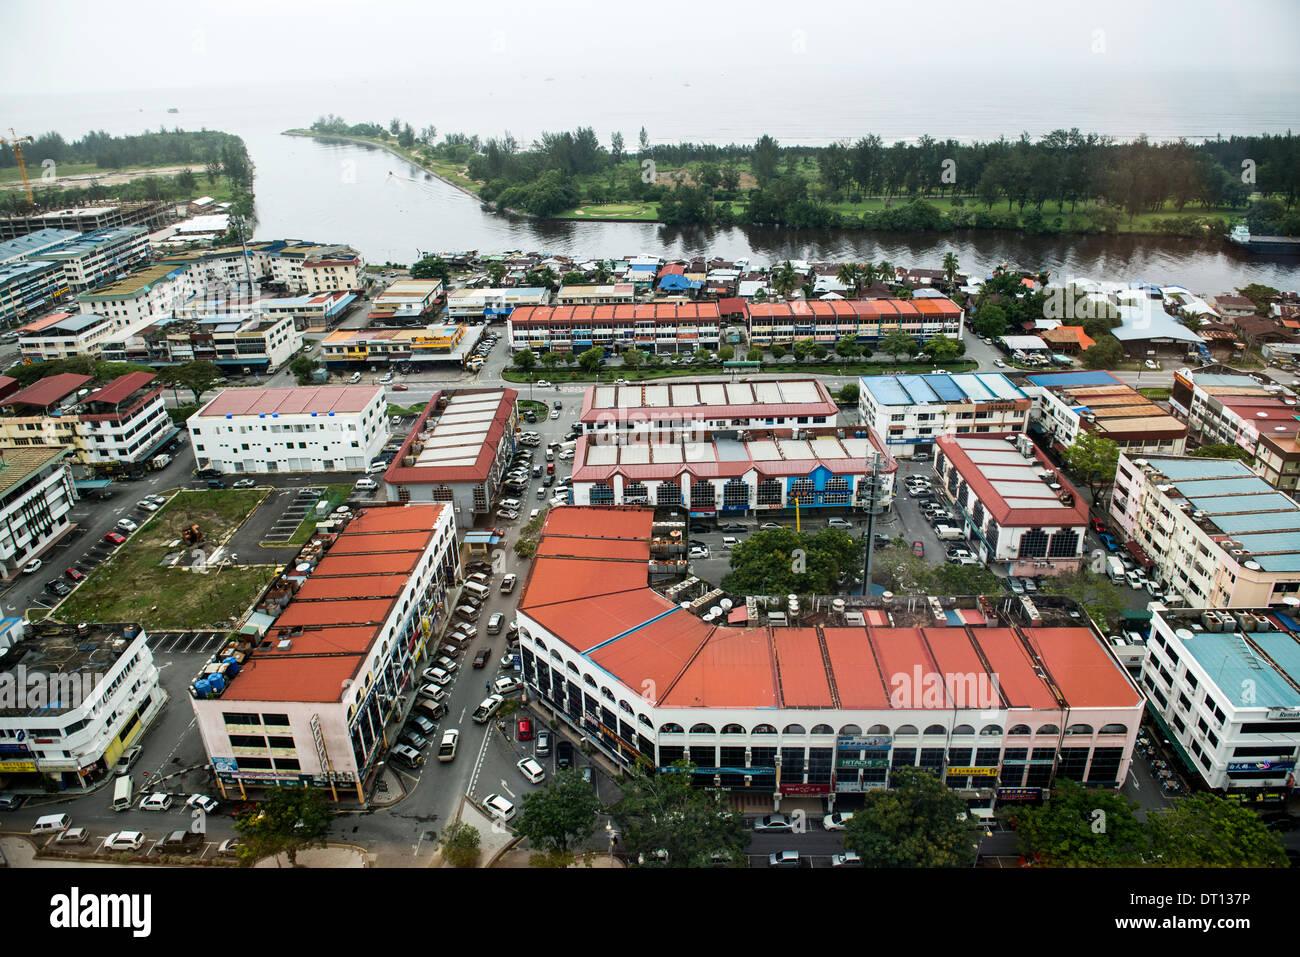 A view of Miri, Sarawak. - Stock Image